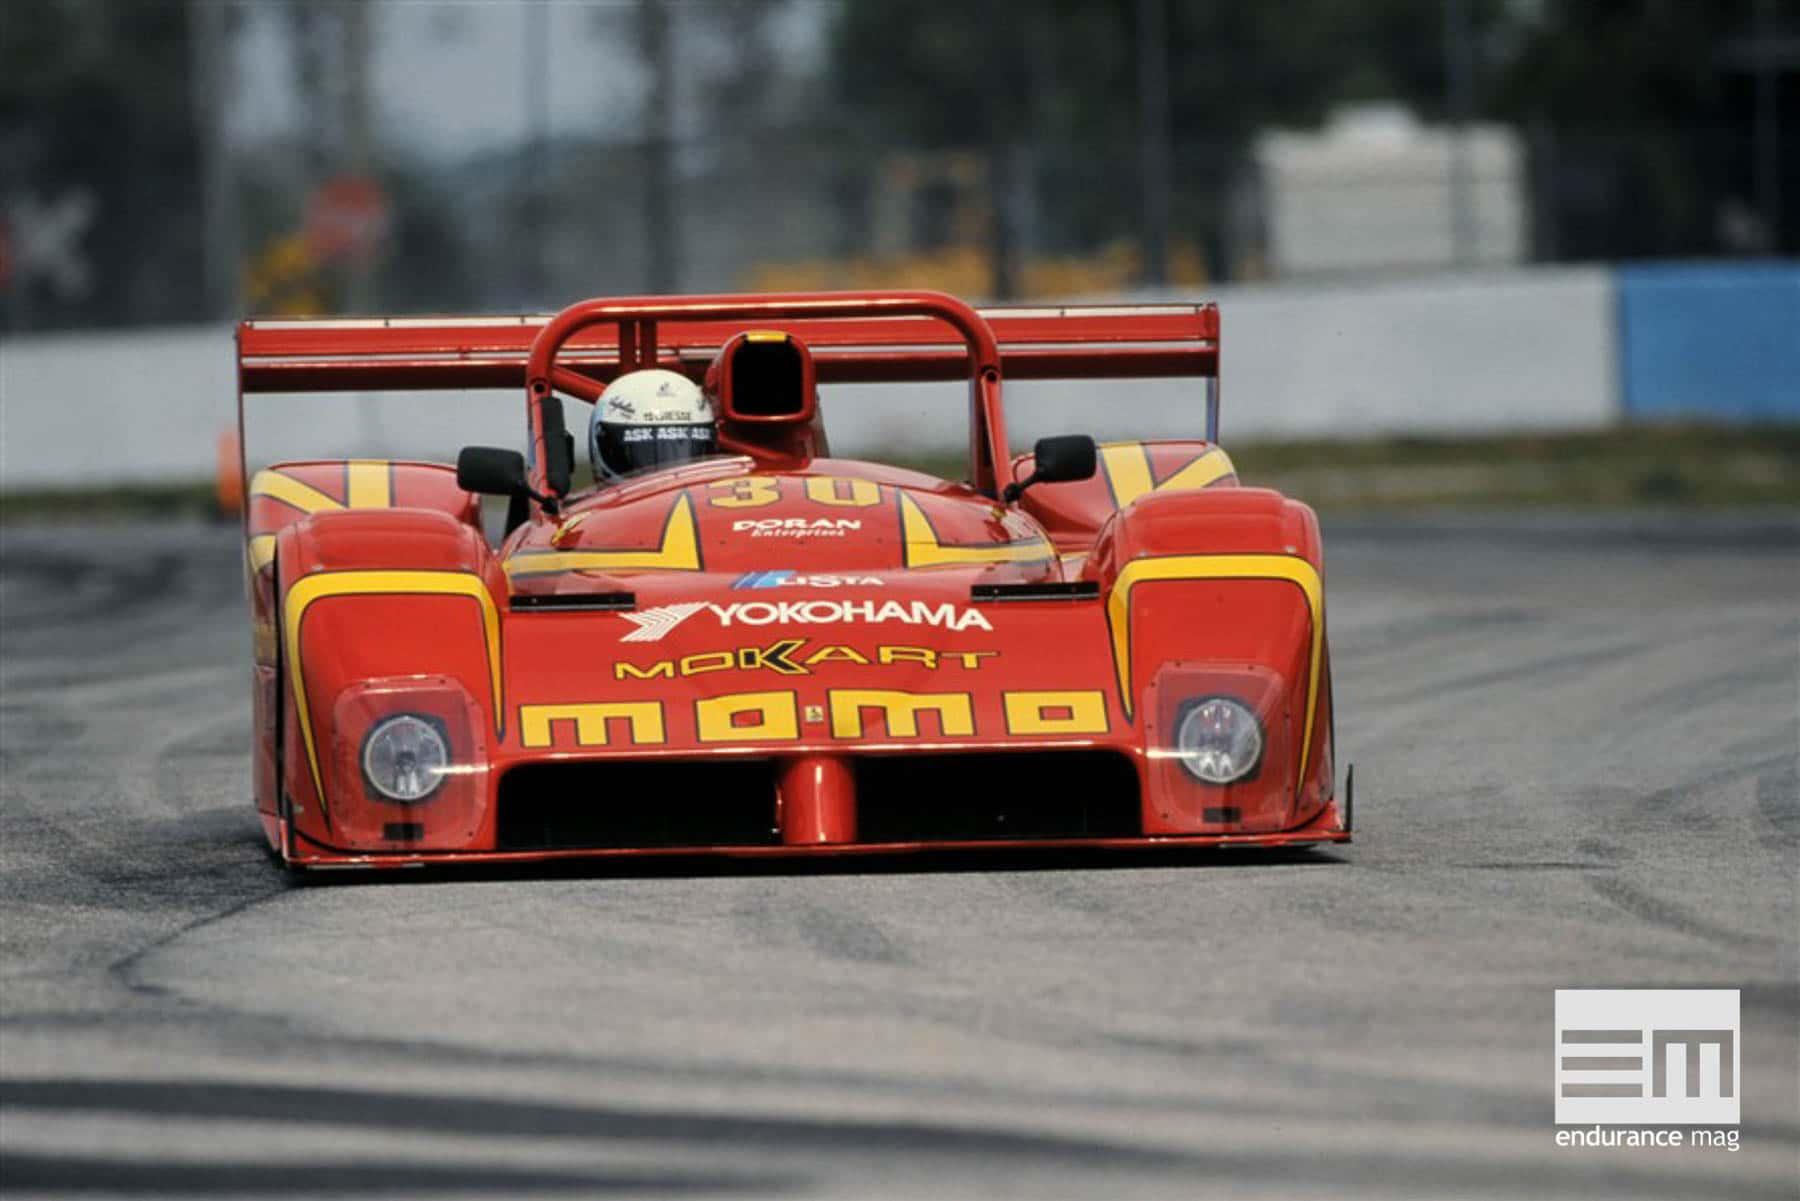 Ferrari 333 SP, le rêve américain